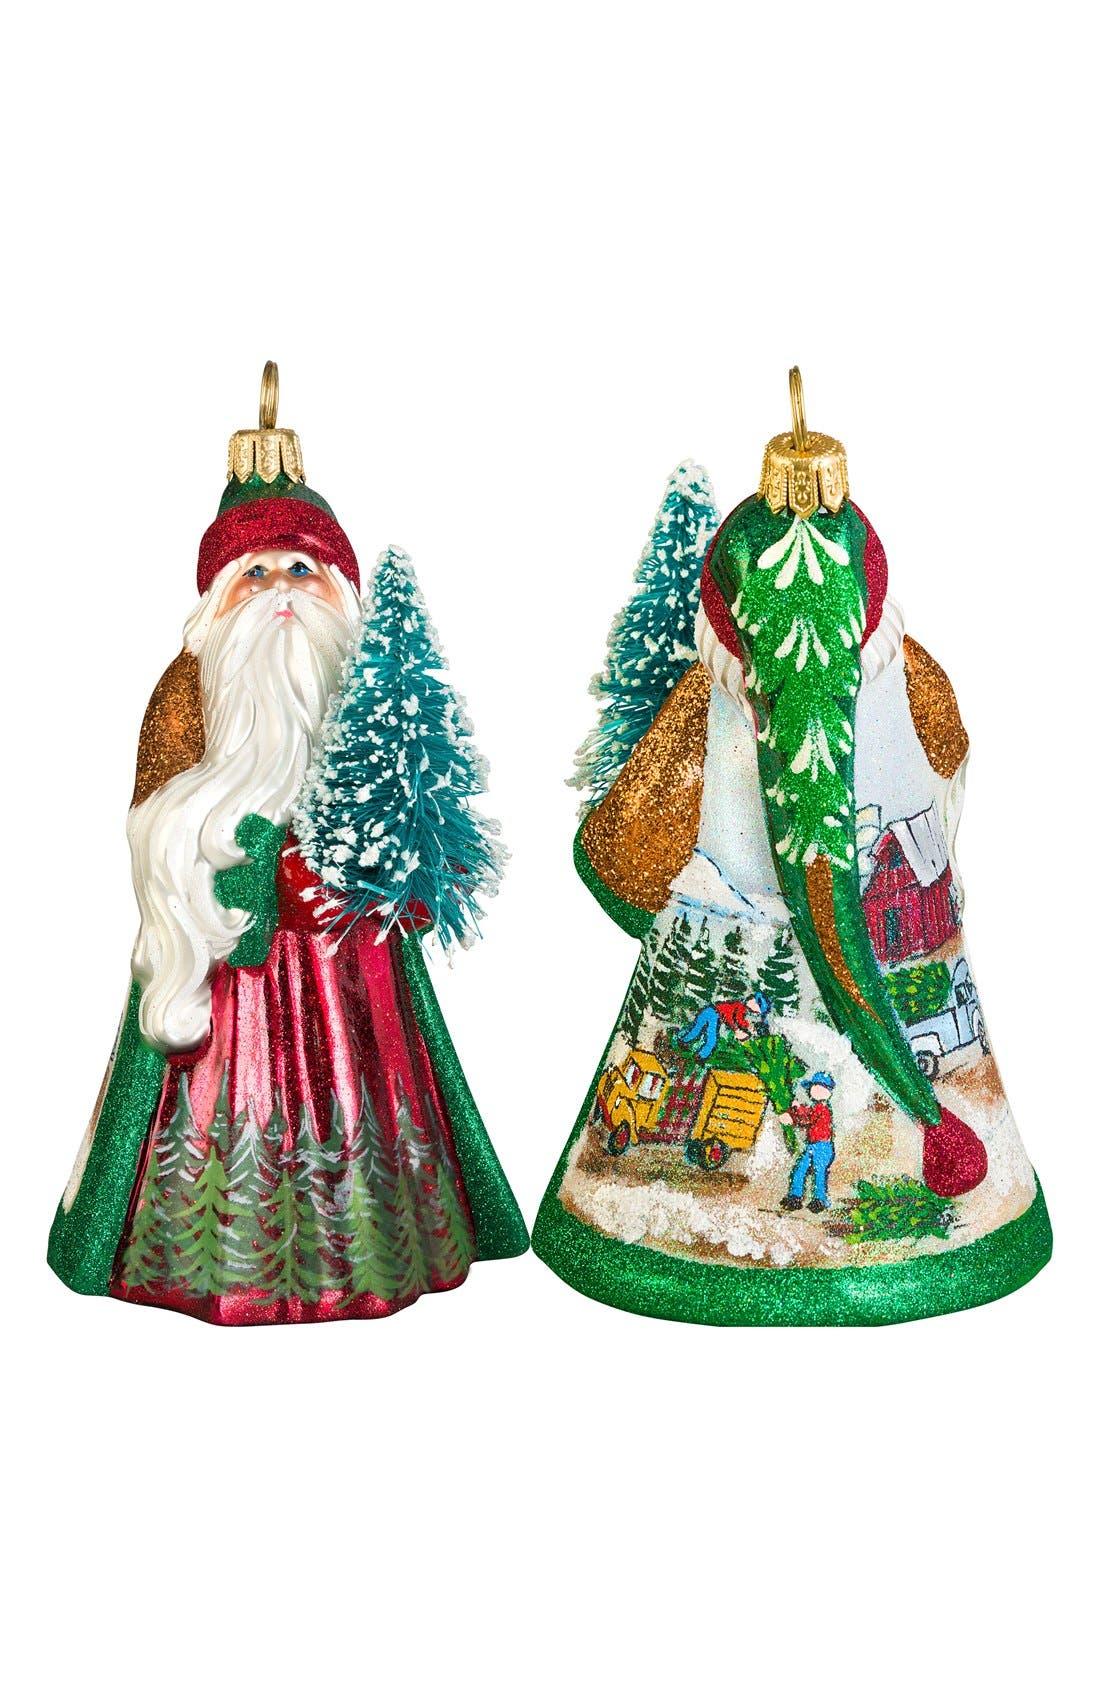 'Glitterazzi' Santa Ornament,                             Main thumbnail 1, color,                             CHRISTMAS TREE FARM